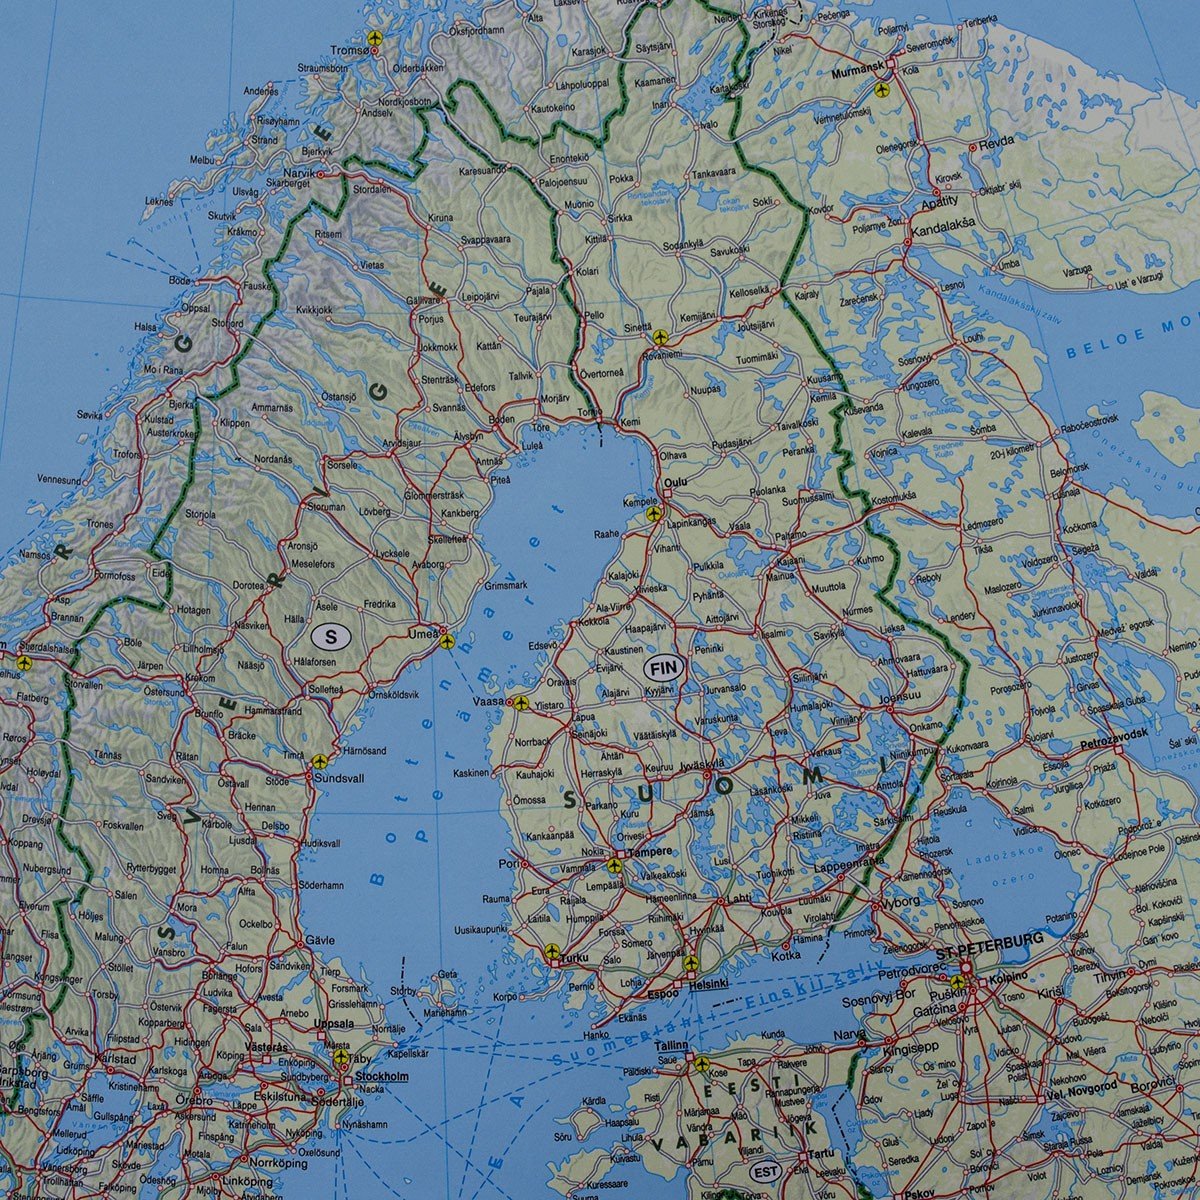 Europa Mapa Scienna Koleje Promy 1 5 500 000 136x91 Cm